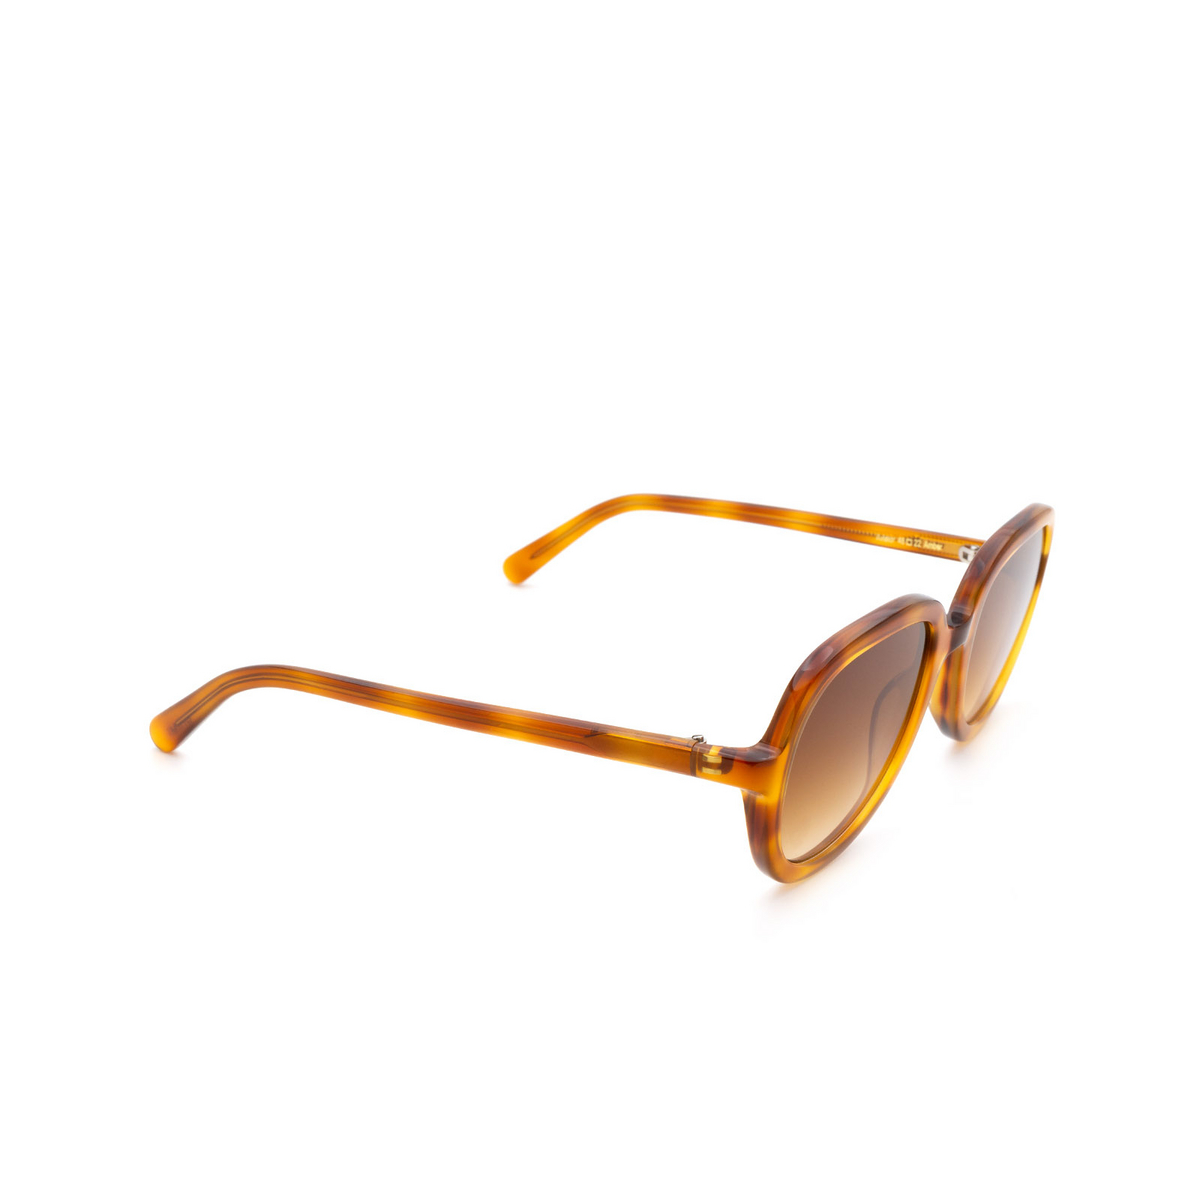 Chimi® Square Sunglasses: Voyage Aviator color Amber - three-quarters view.